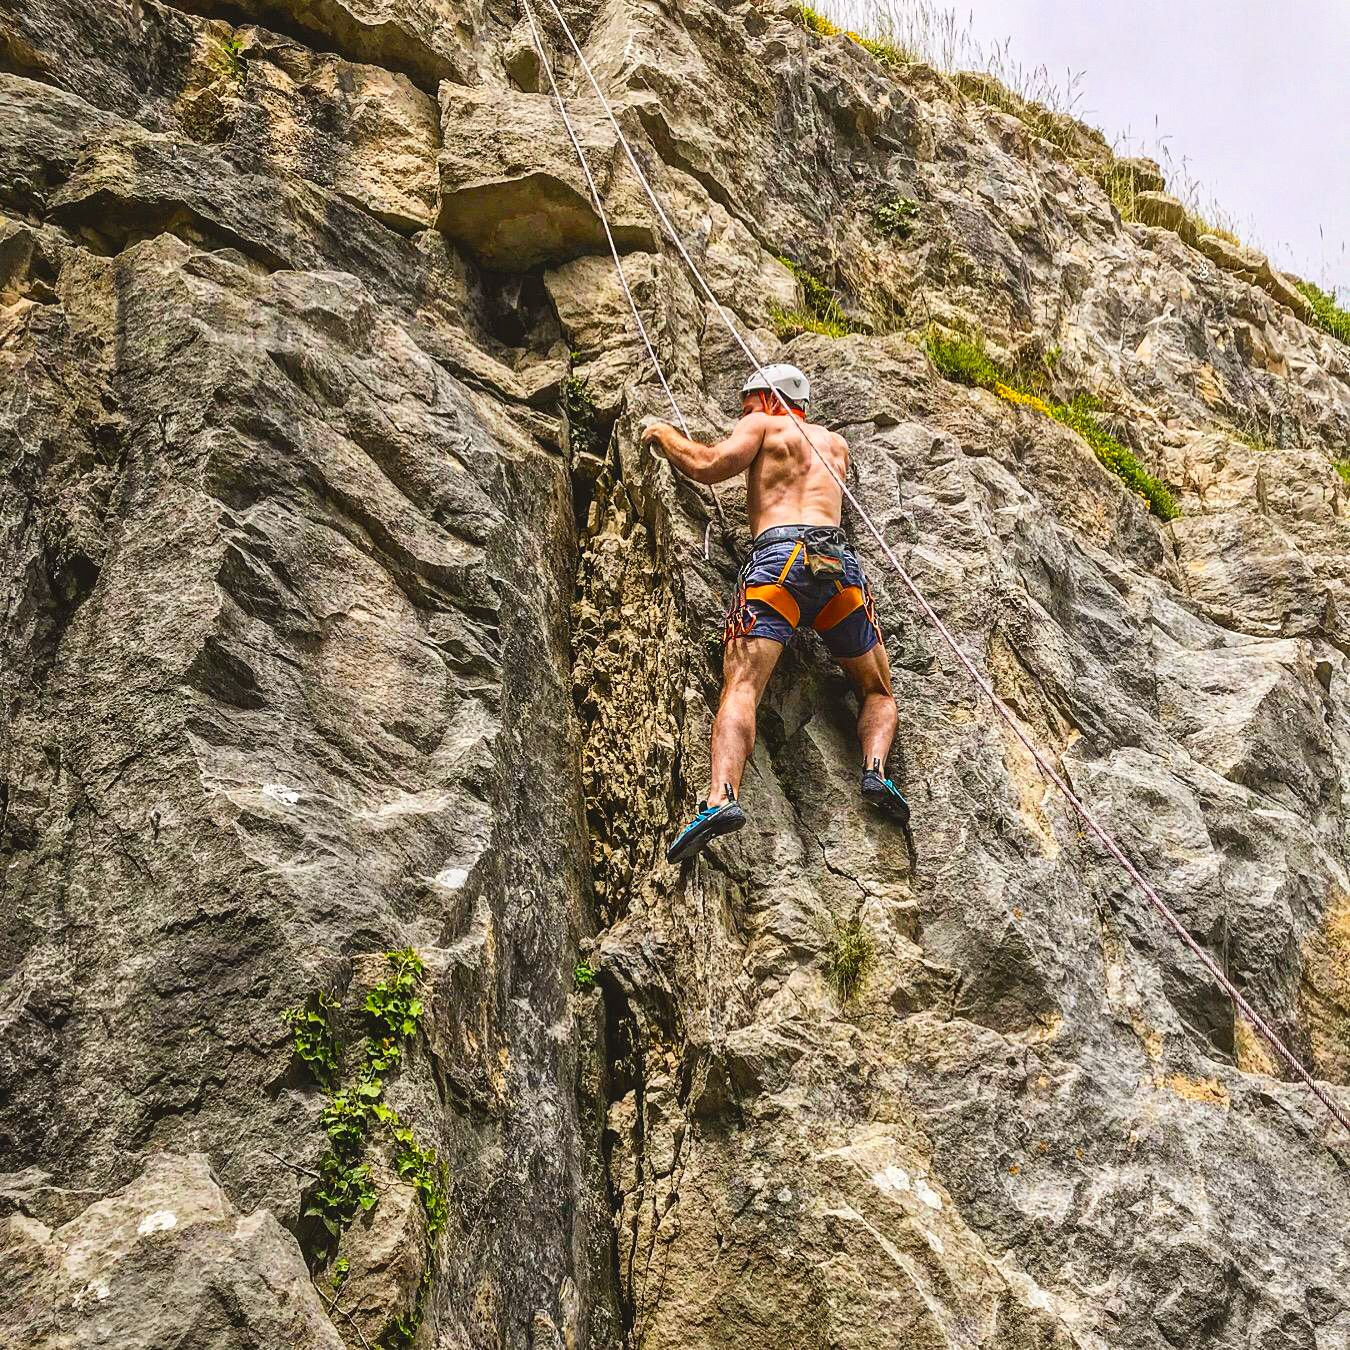 Rock-climbing-for-beginners---Demystifying-the-sport-of-climbing-Beyonk